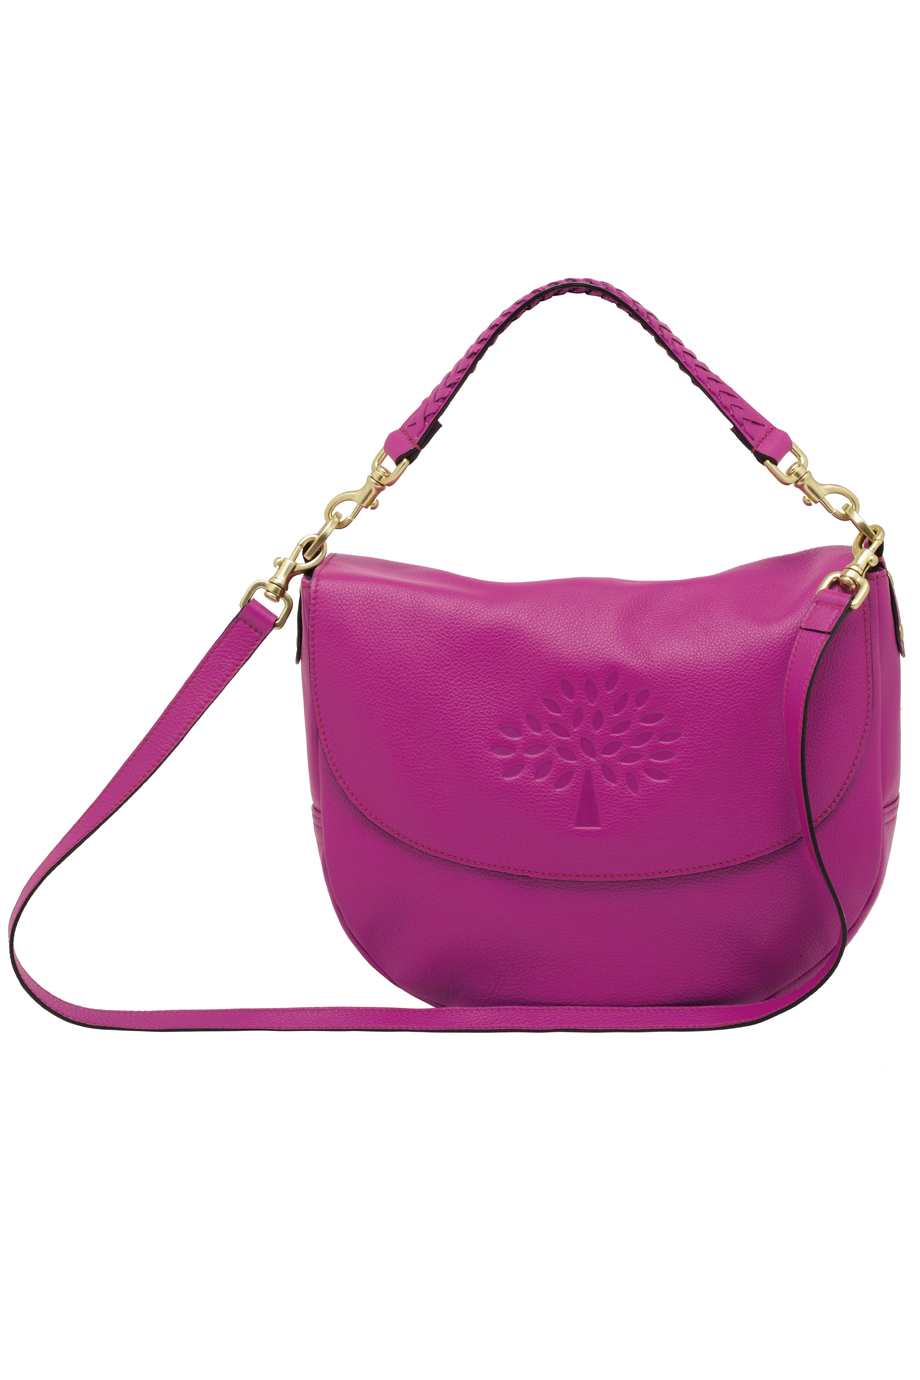 aea08f175ca4 denmark mulberry amberley striped satchel bag lyst 4f5b0 96ddf  canada lyst  mulberry effie satchel in purple 0a6a0 6909d